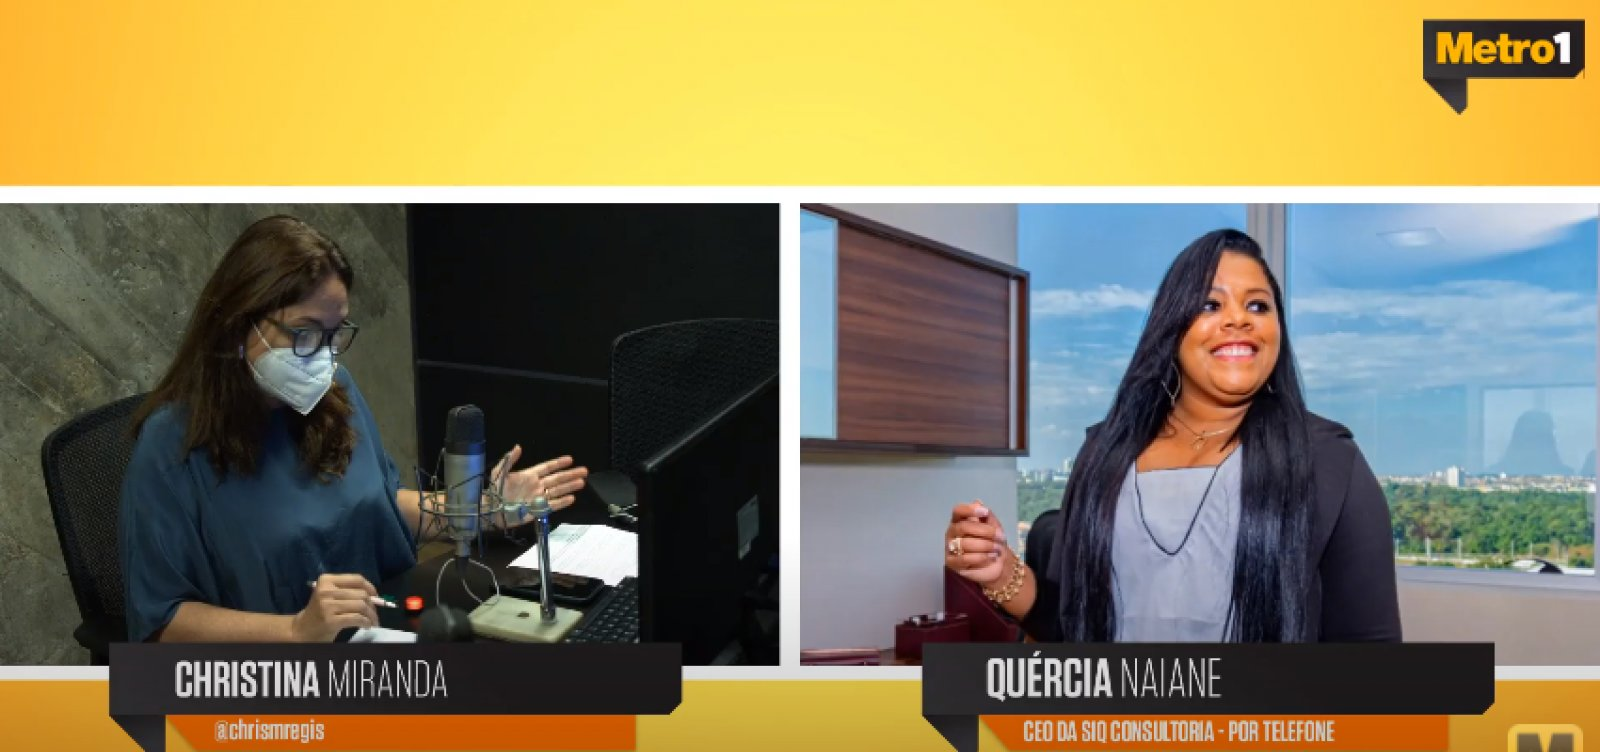 Edital do governo da Bahia para pequenas empresas é tema de entrevista no Metrópole Serviço